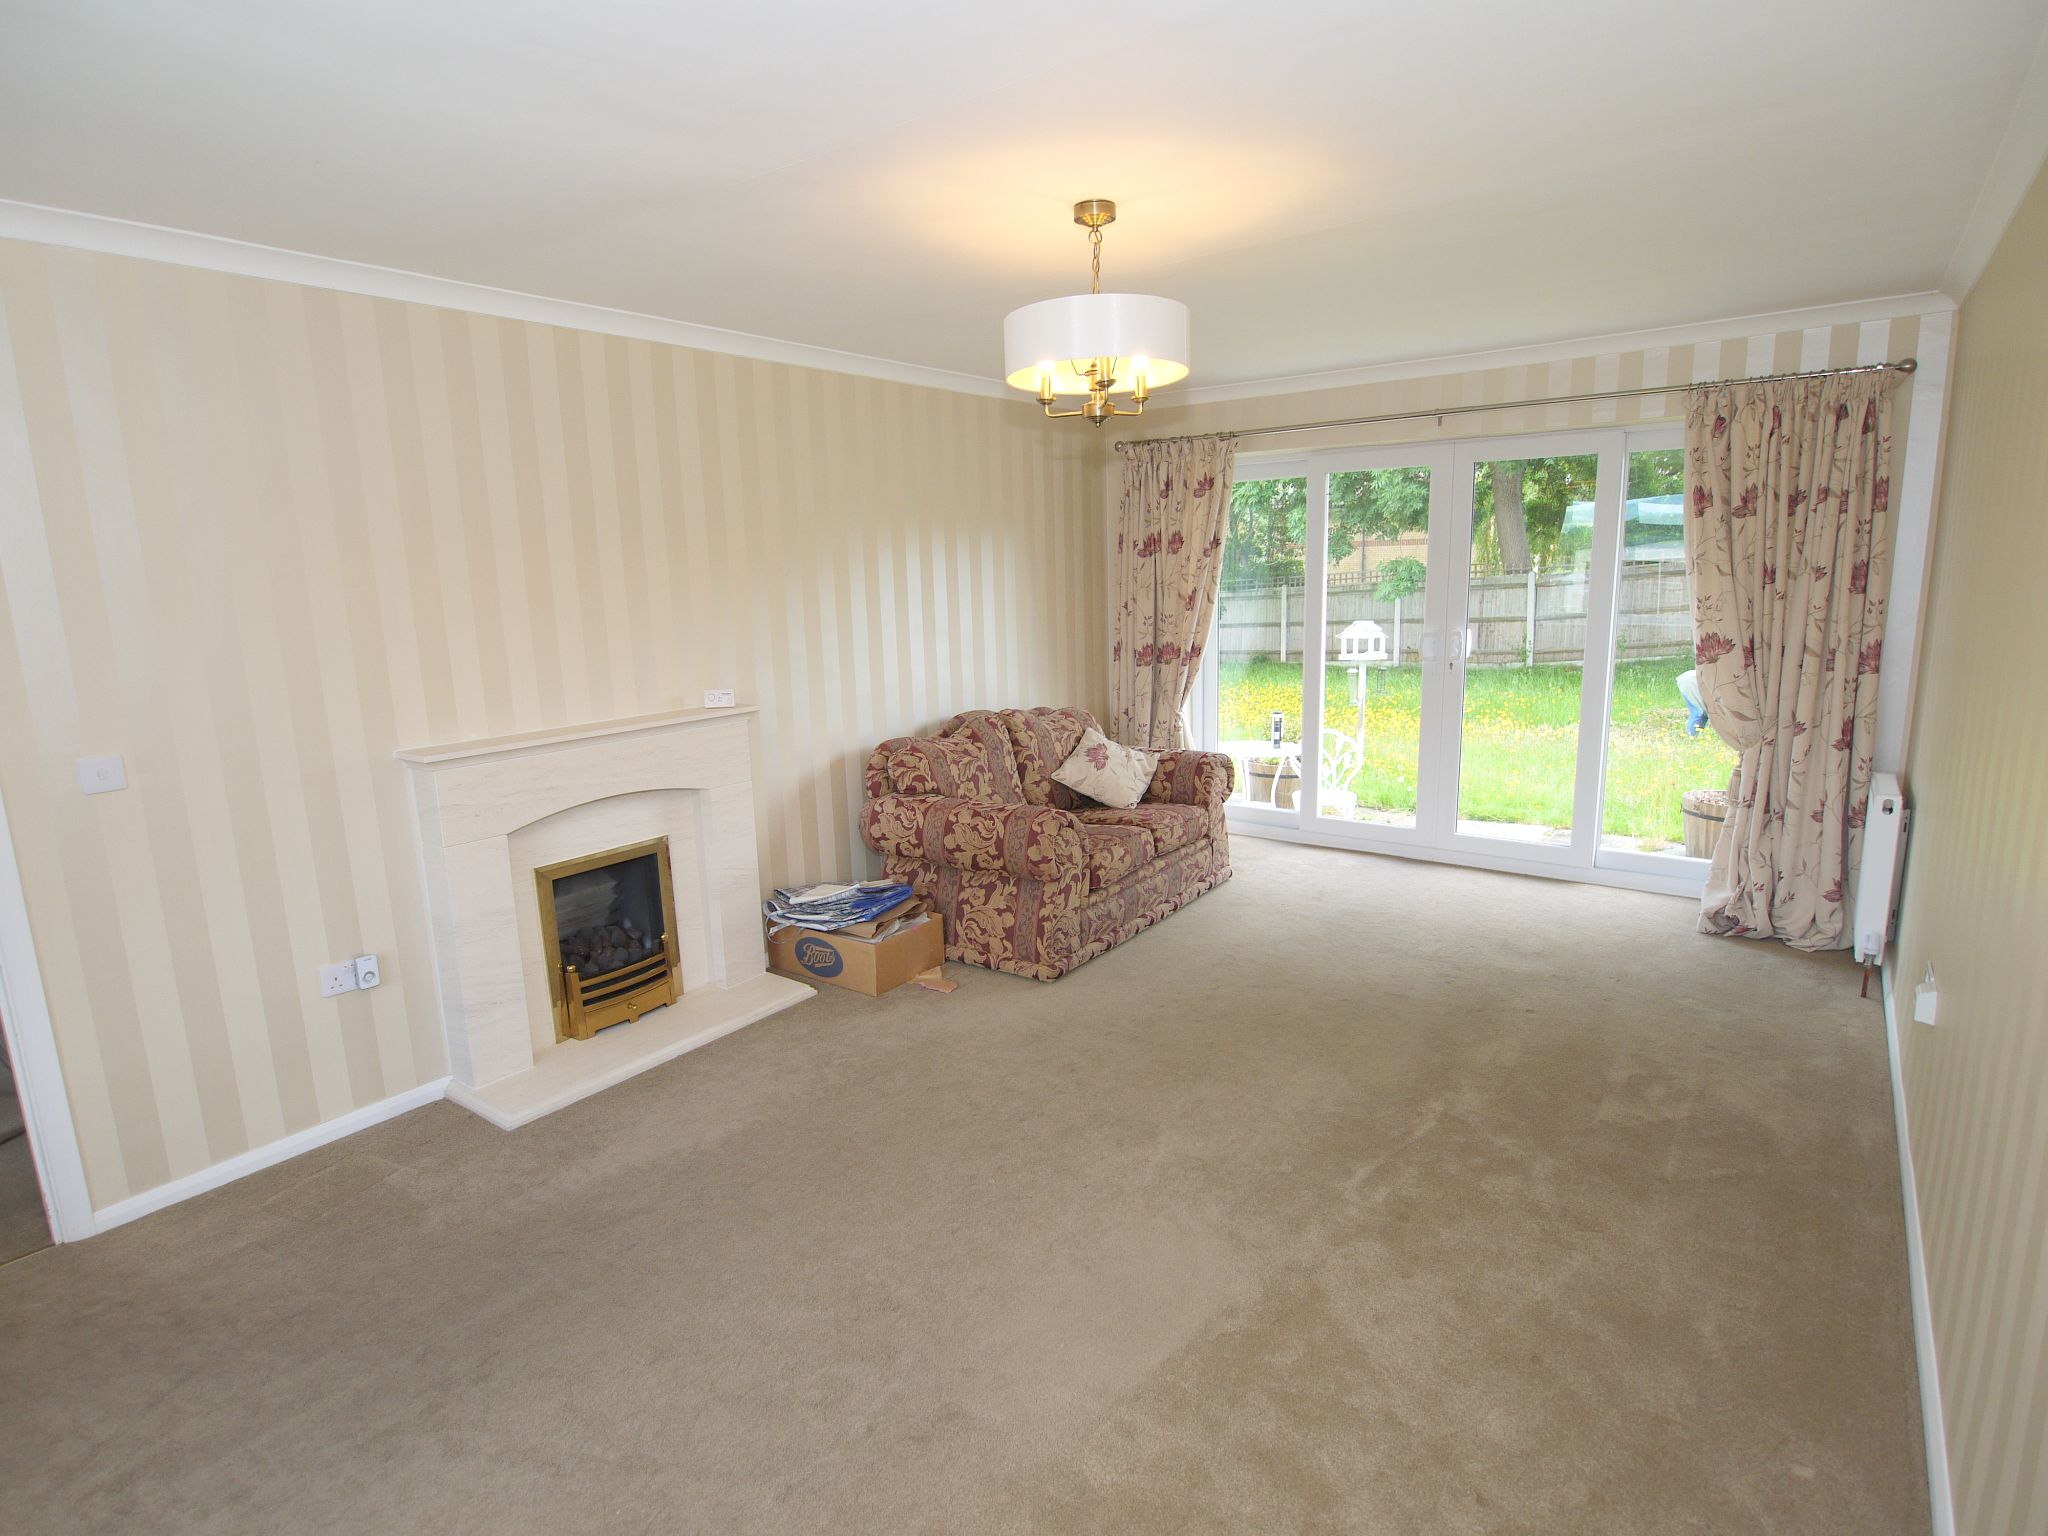 2 bedroom detached bungalow Sold in Sevenoaks - Photograph 4